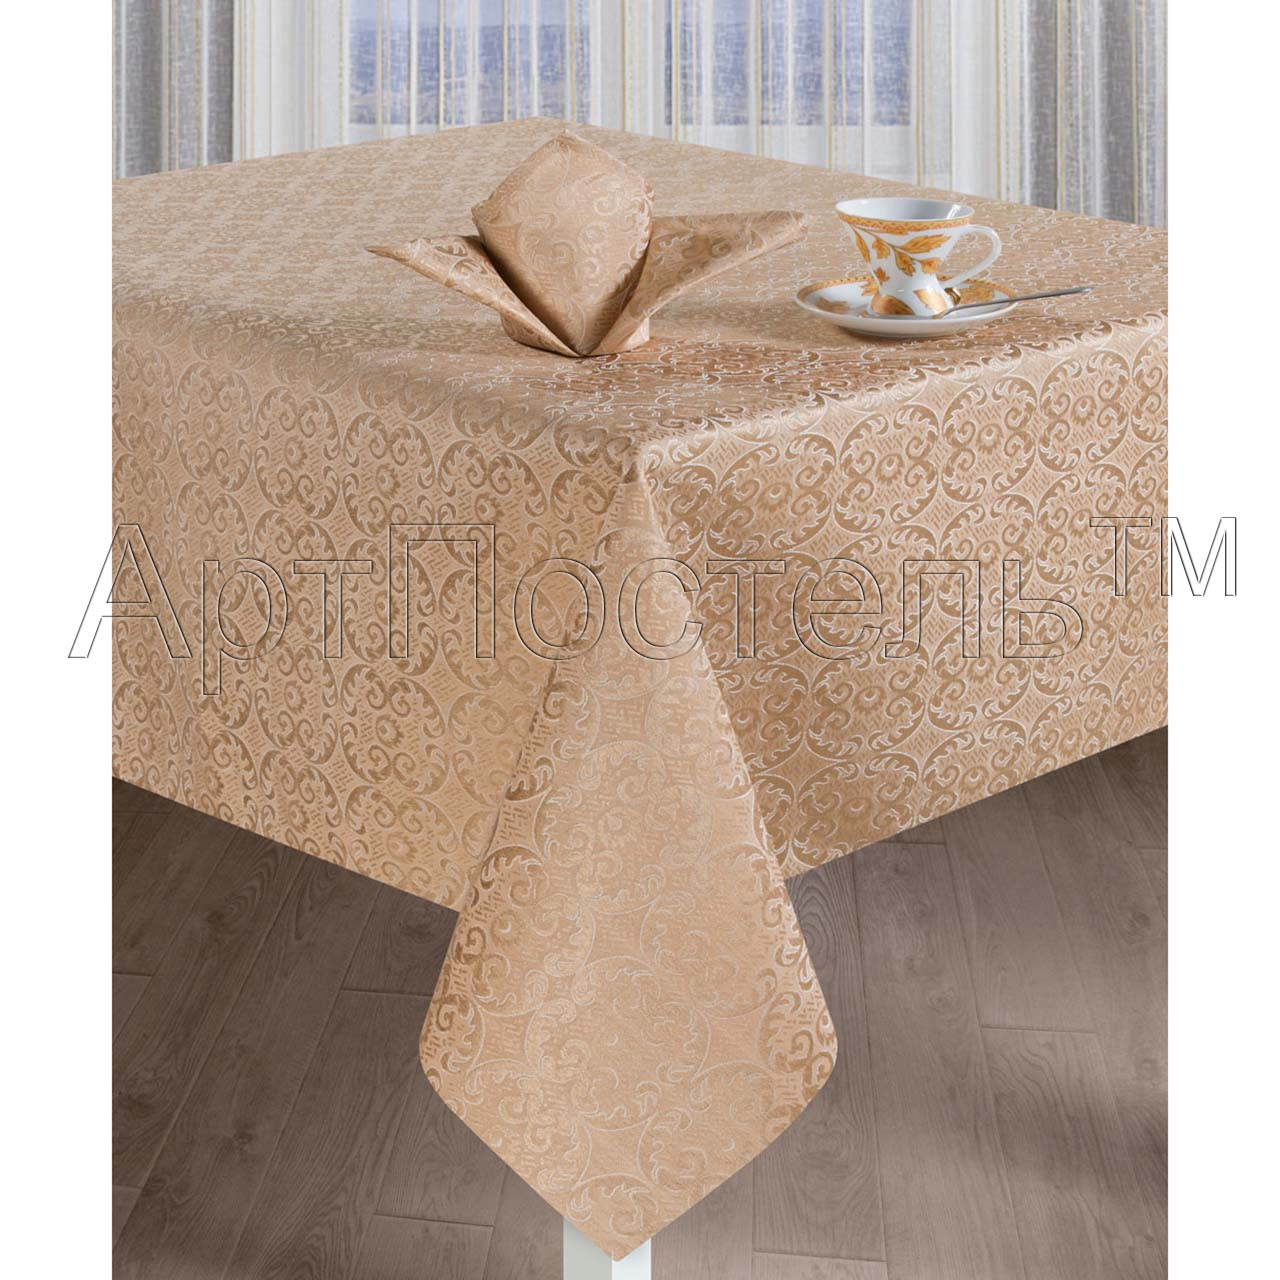 Кухонные принадлежности Марго Капучино р. 150х220Скатерти<br>Скатерть: 220х150 см - 1 шт. <br>Салфетка: 40х40 см - 6 шт.<br><br>Тип: Кухонные принадлежности<br>Размер: 150х220<br>Материал: Жаккард